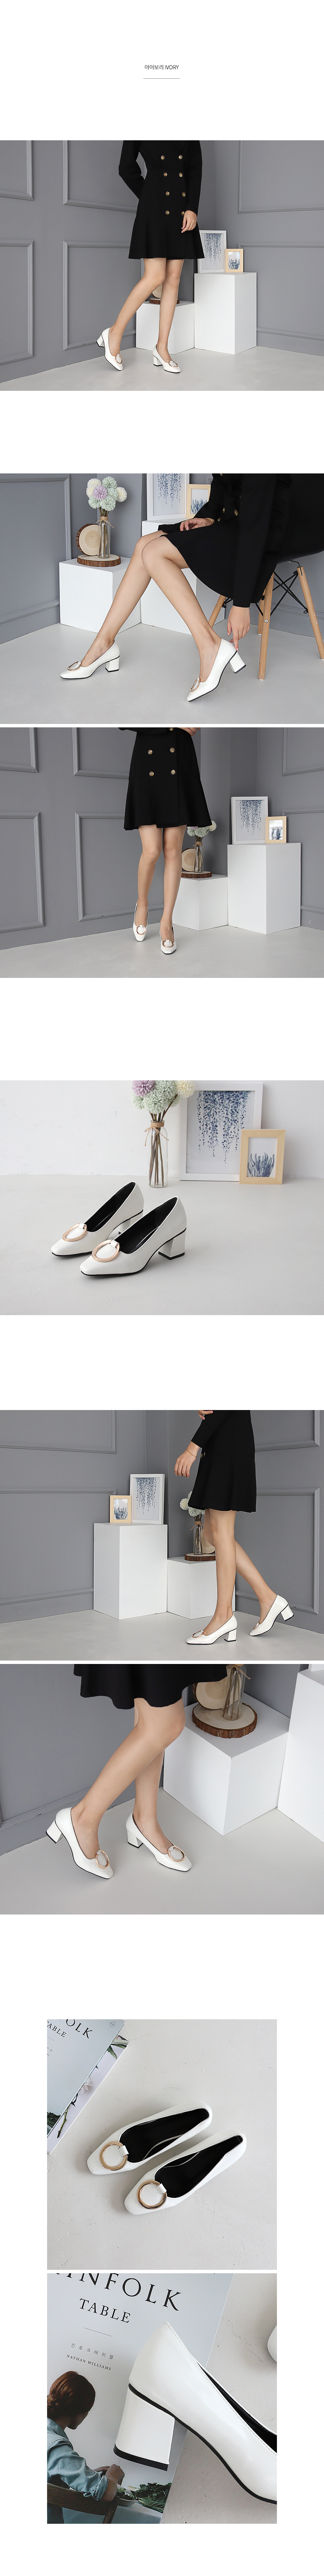 Isshu O-ring embellished square nose middle heel pump 2461